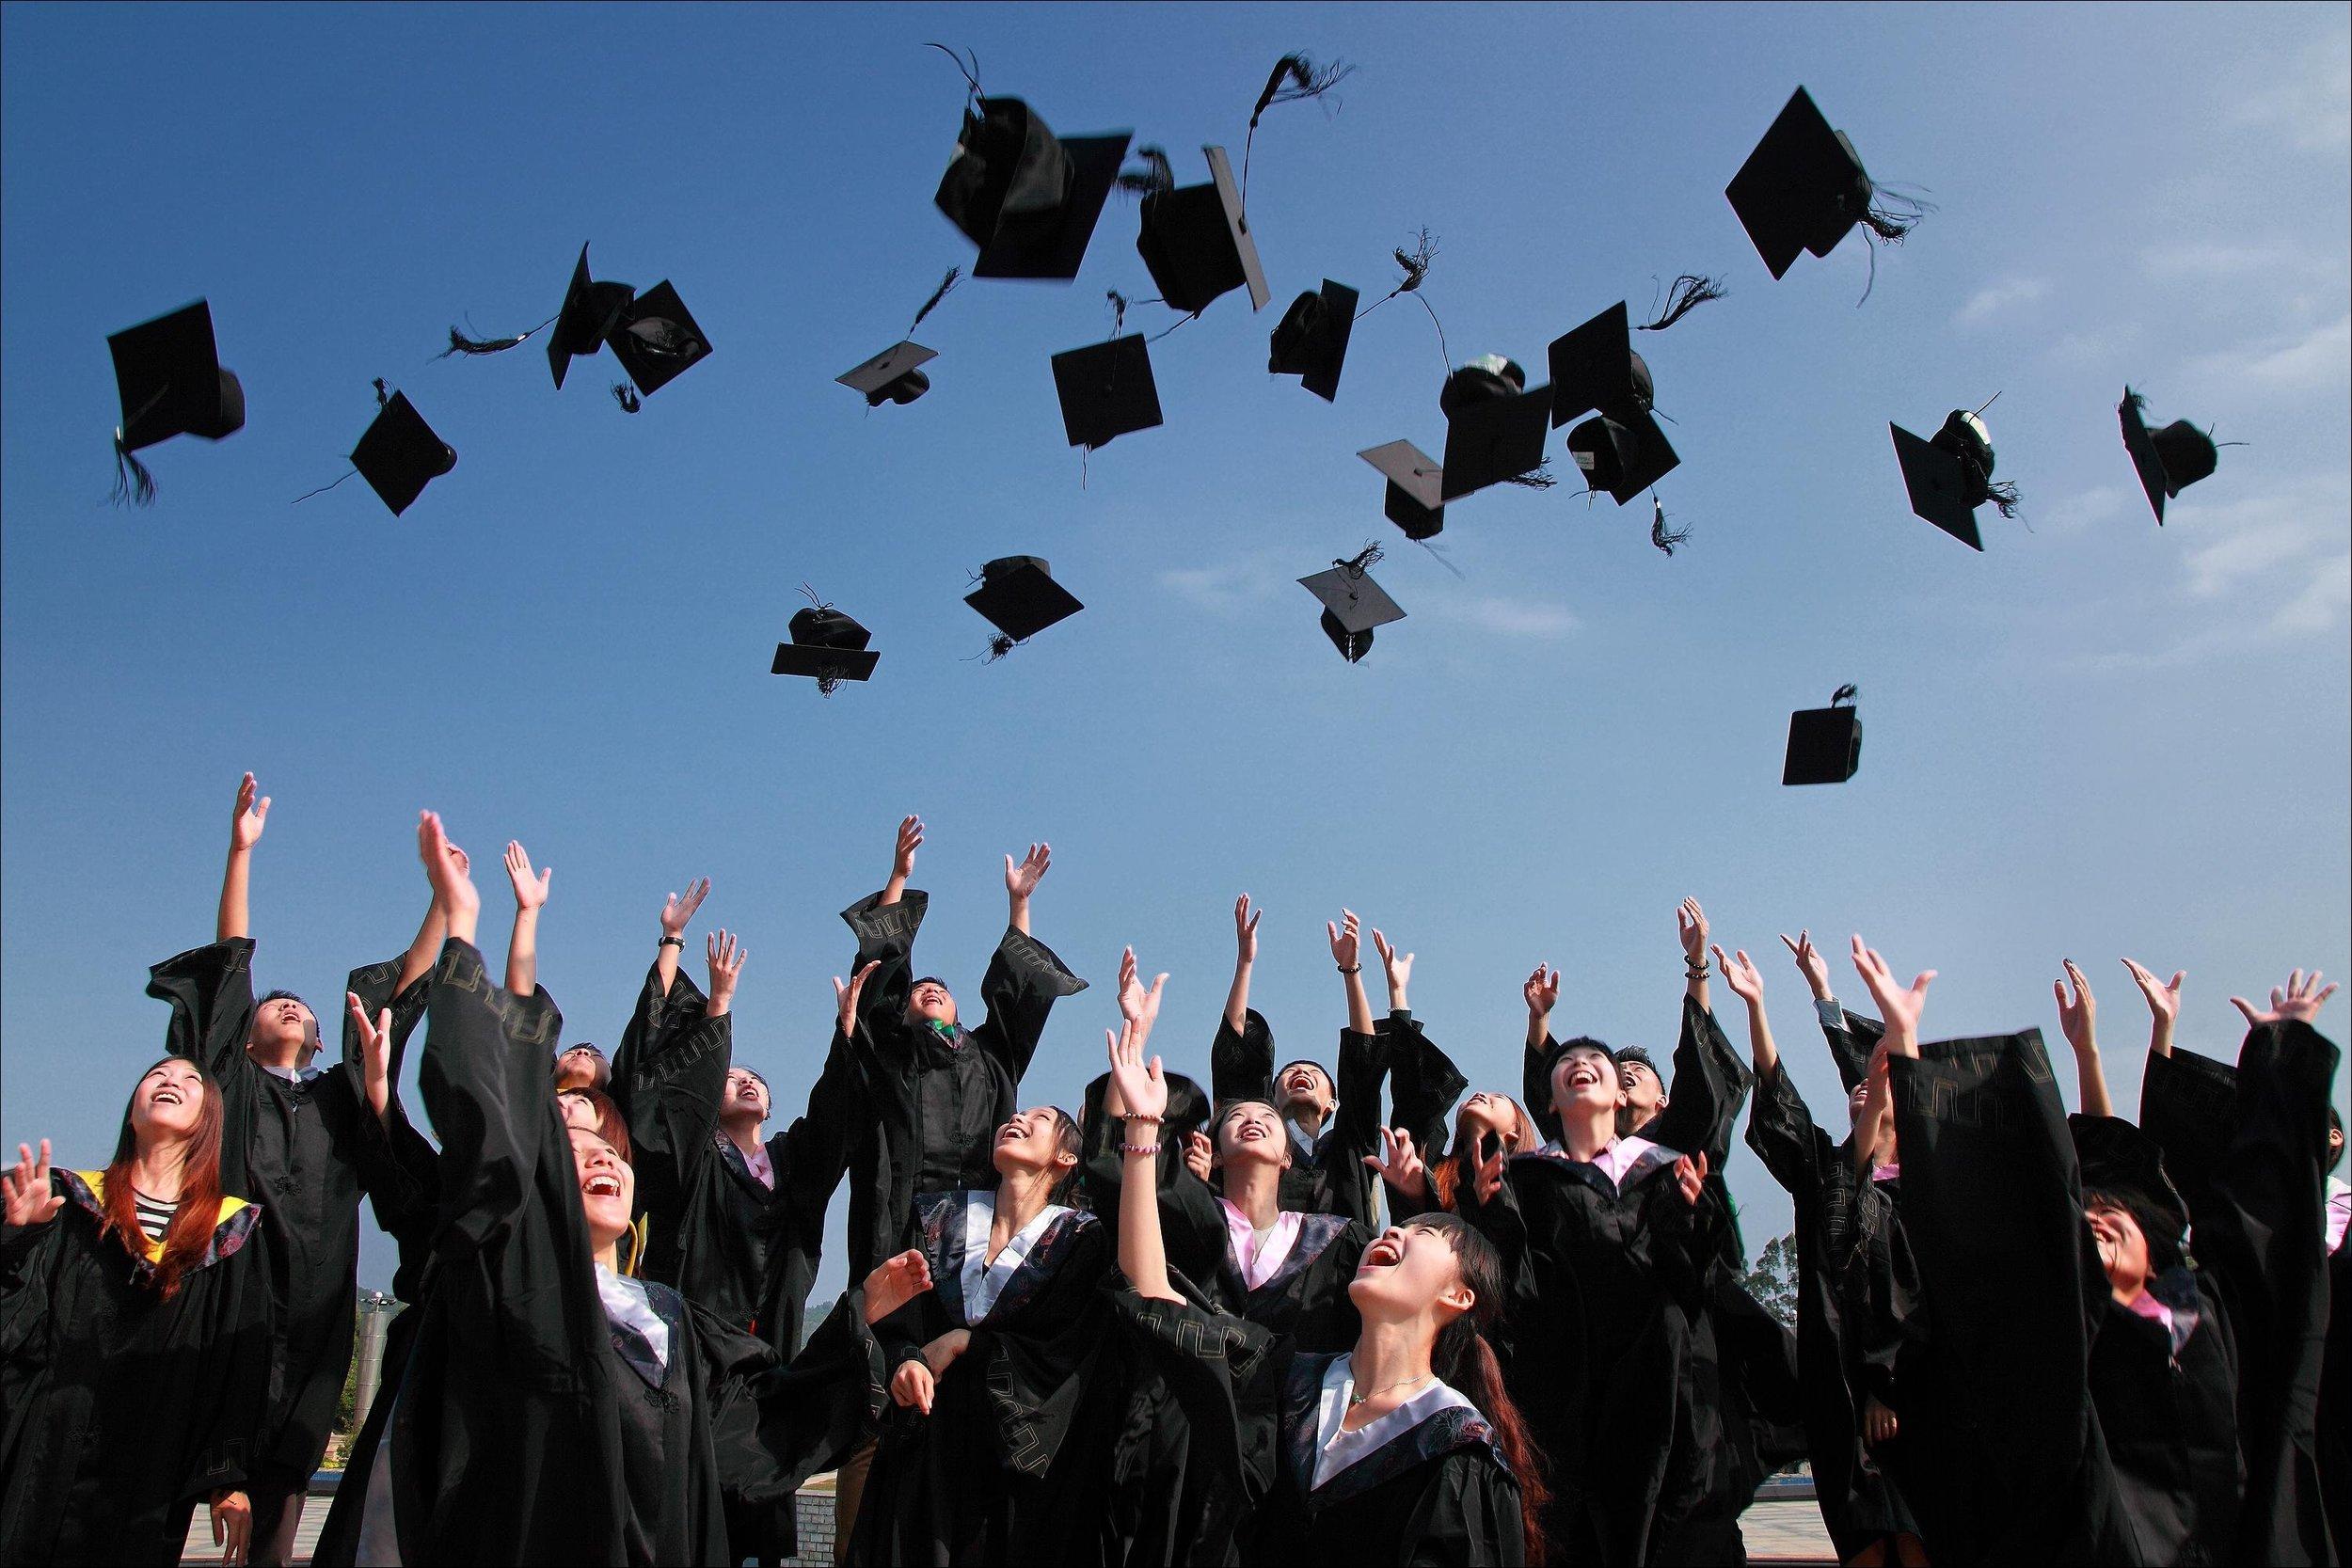 accomplishment-ceremony-college-267885.jpg